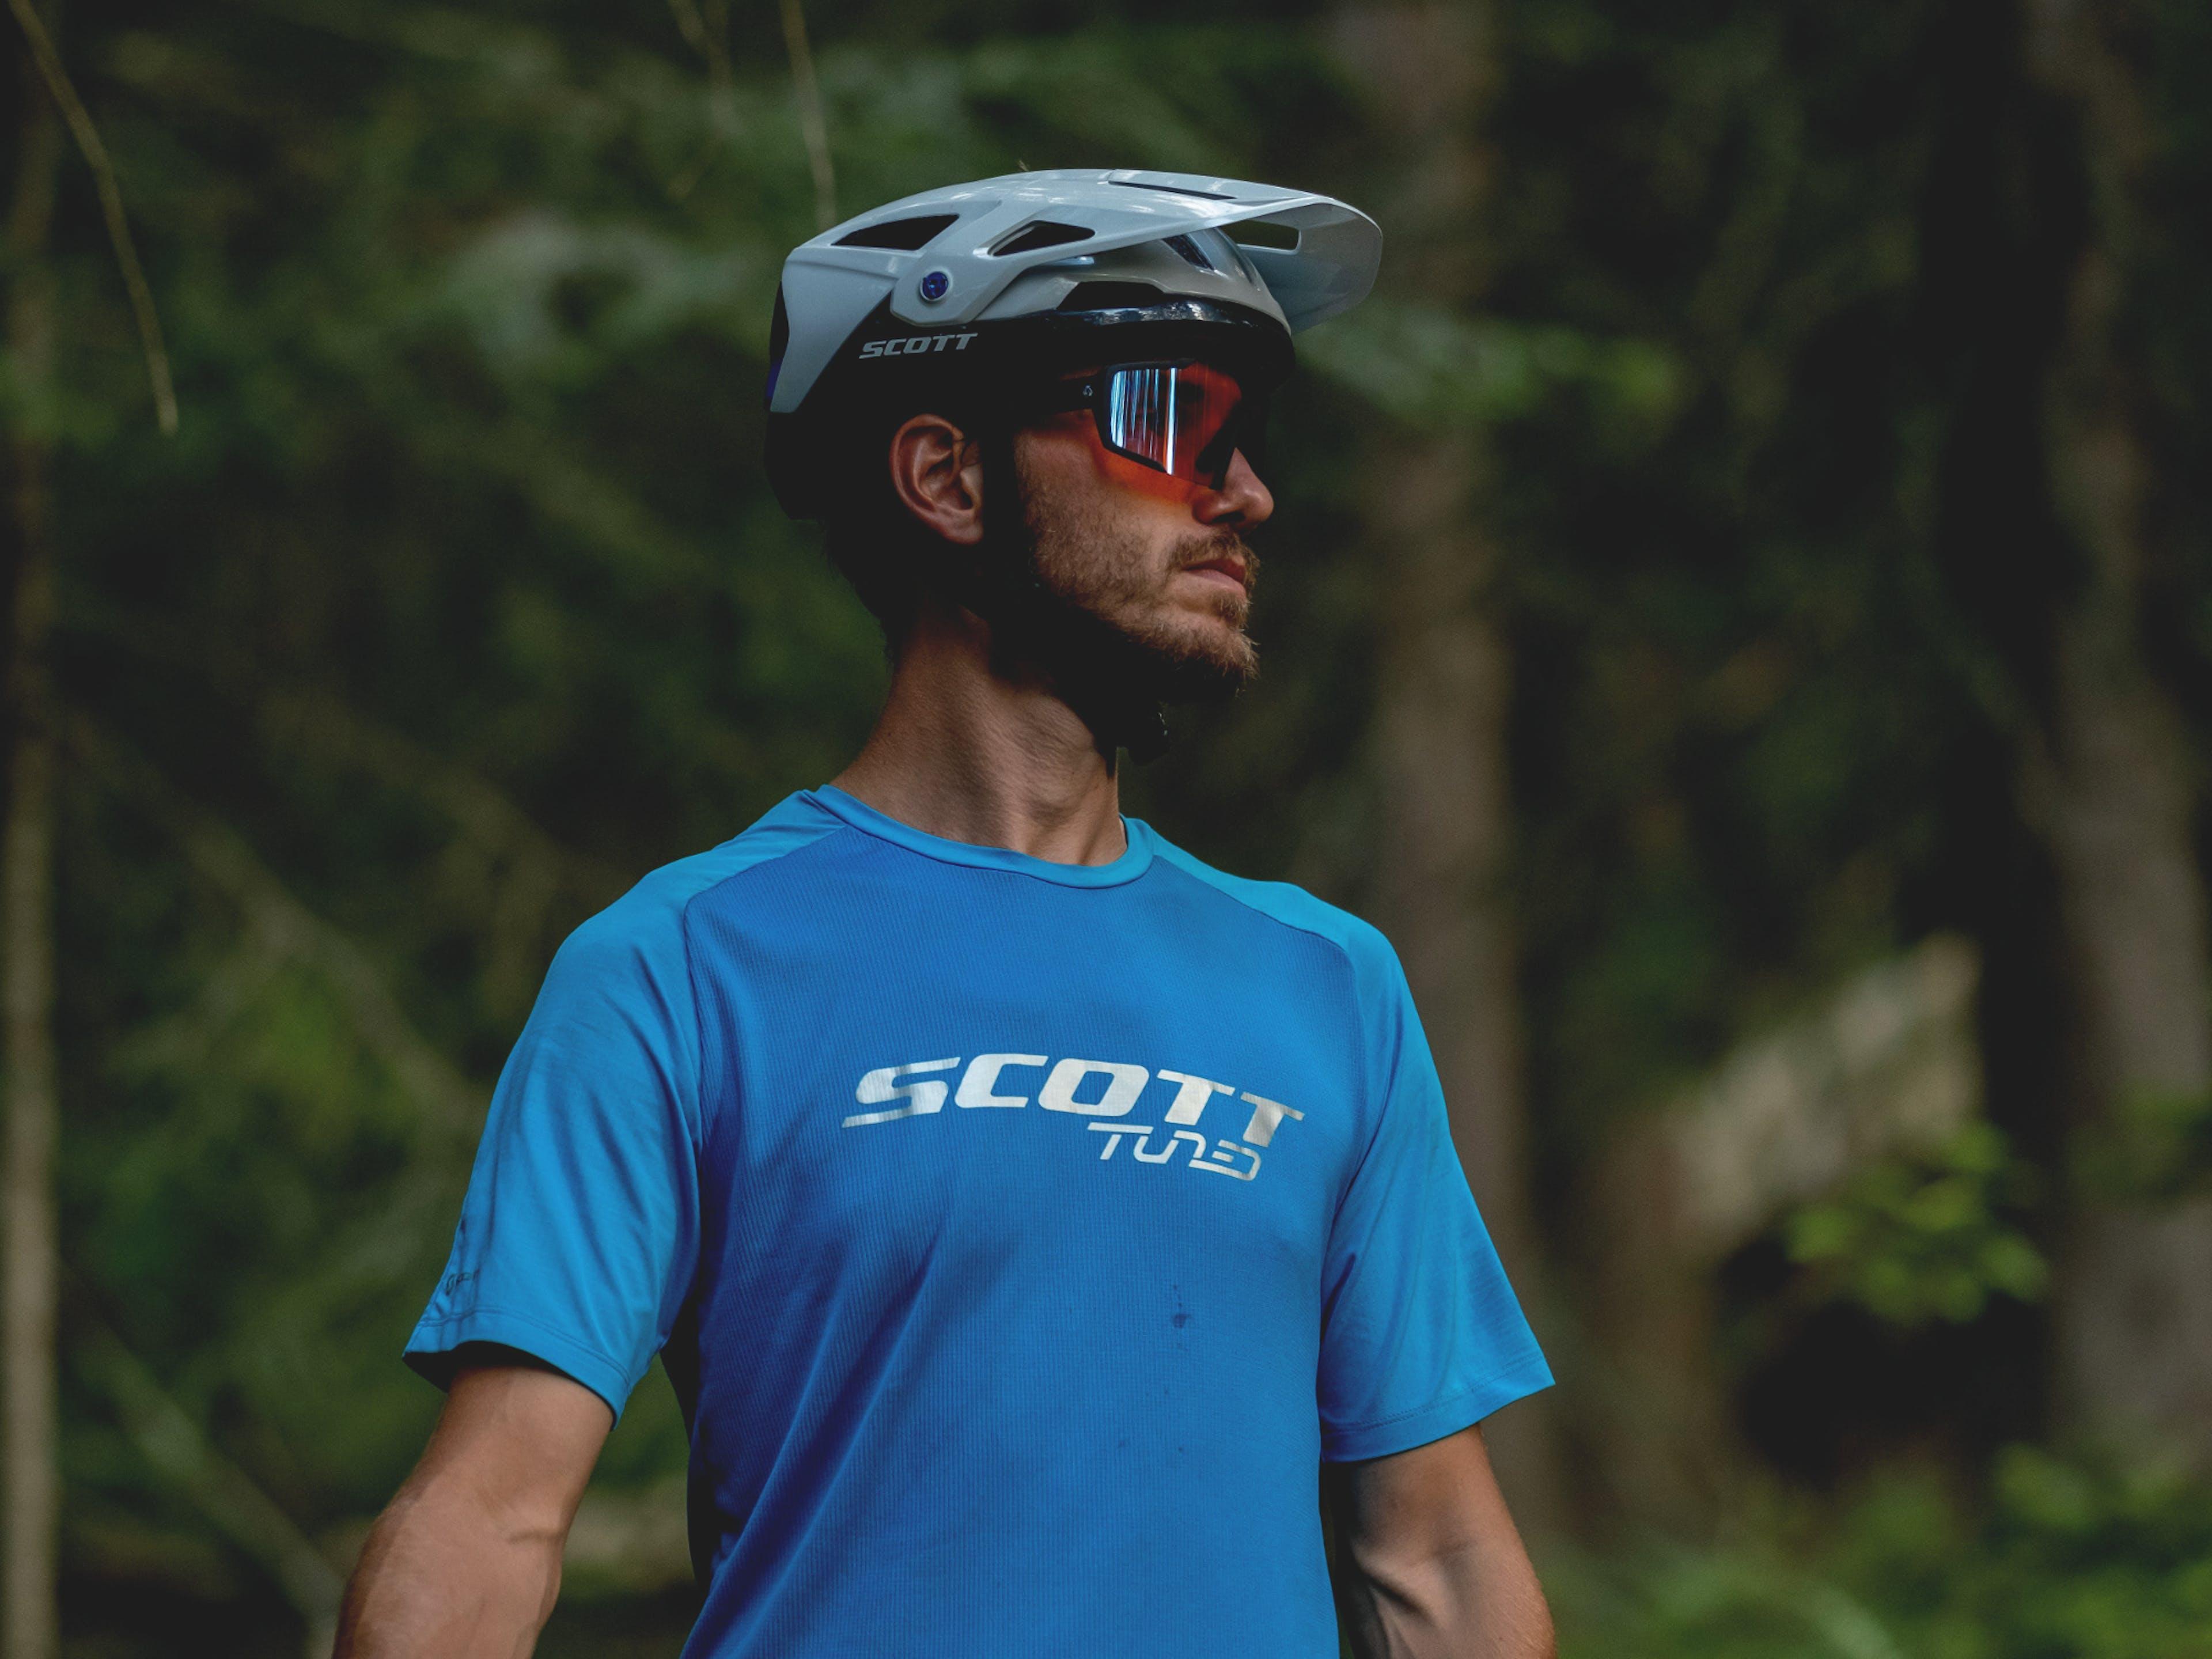 Scott Sports Onlineshop Herren